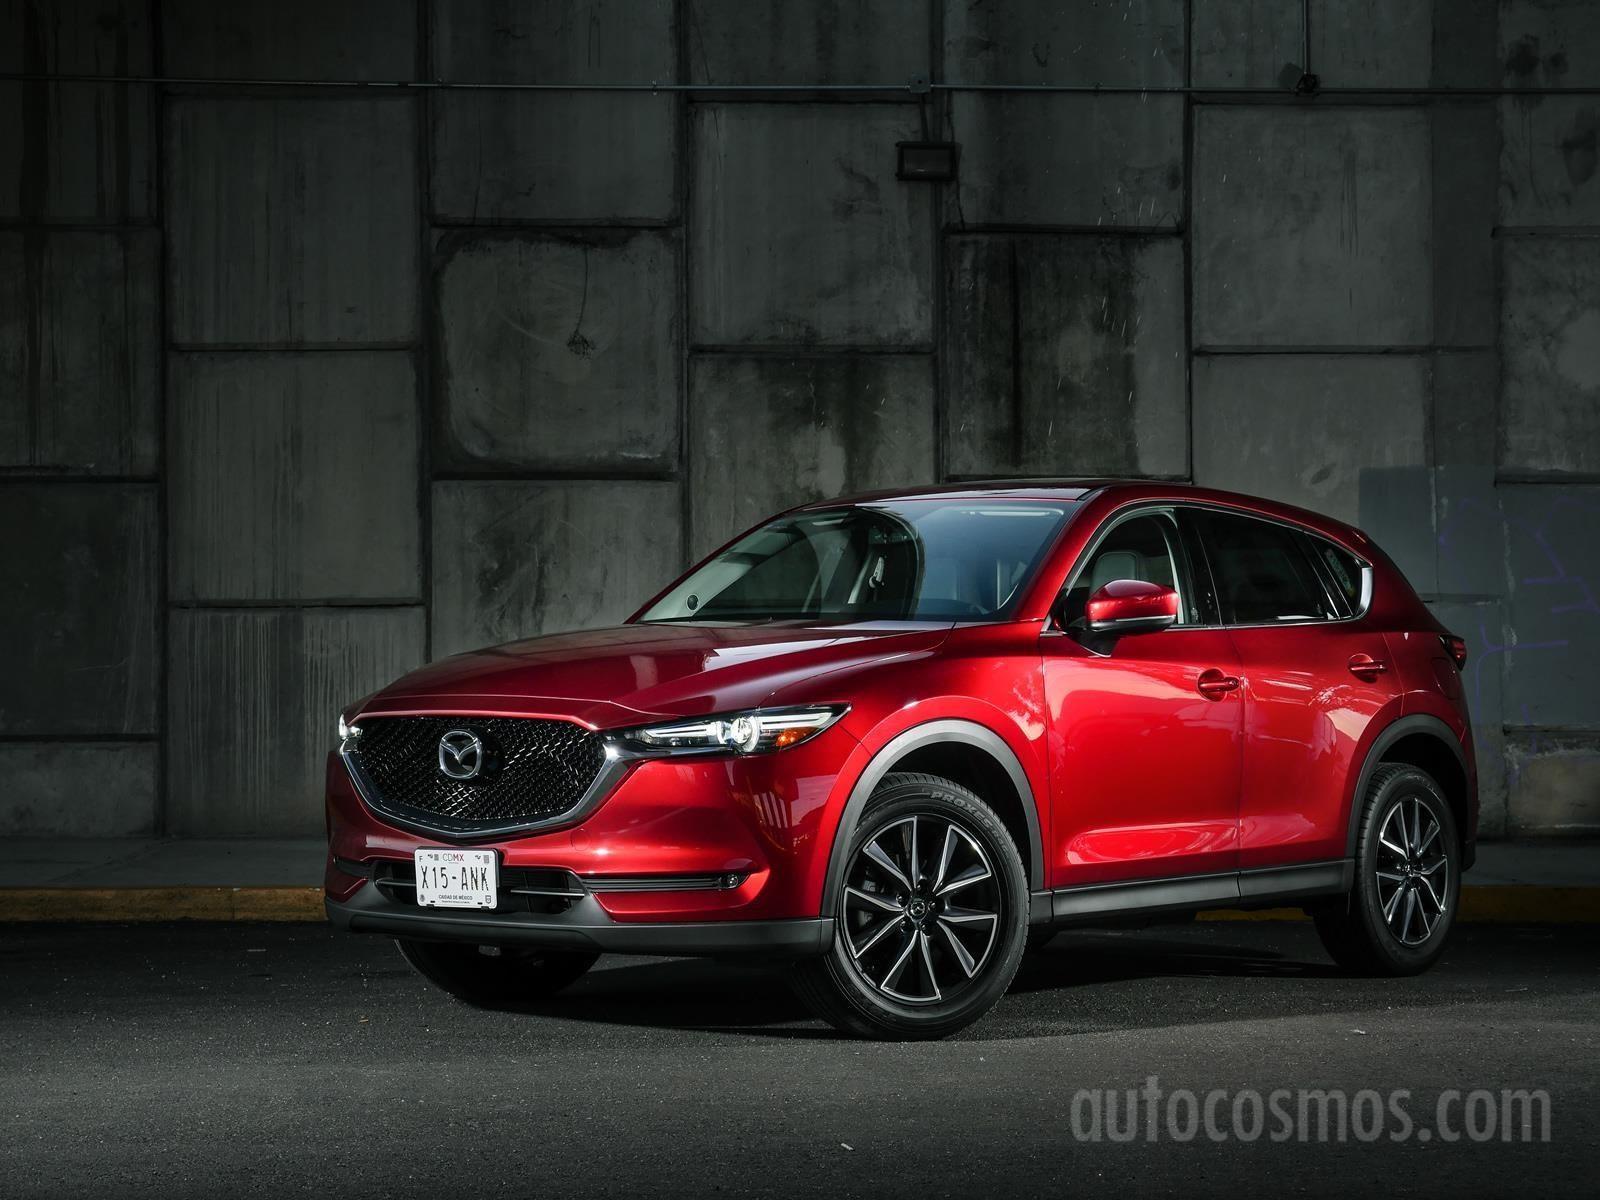 Mazda CX-5 2018 a prueba - Autocosmos.com